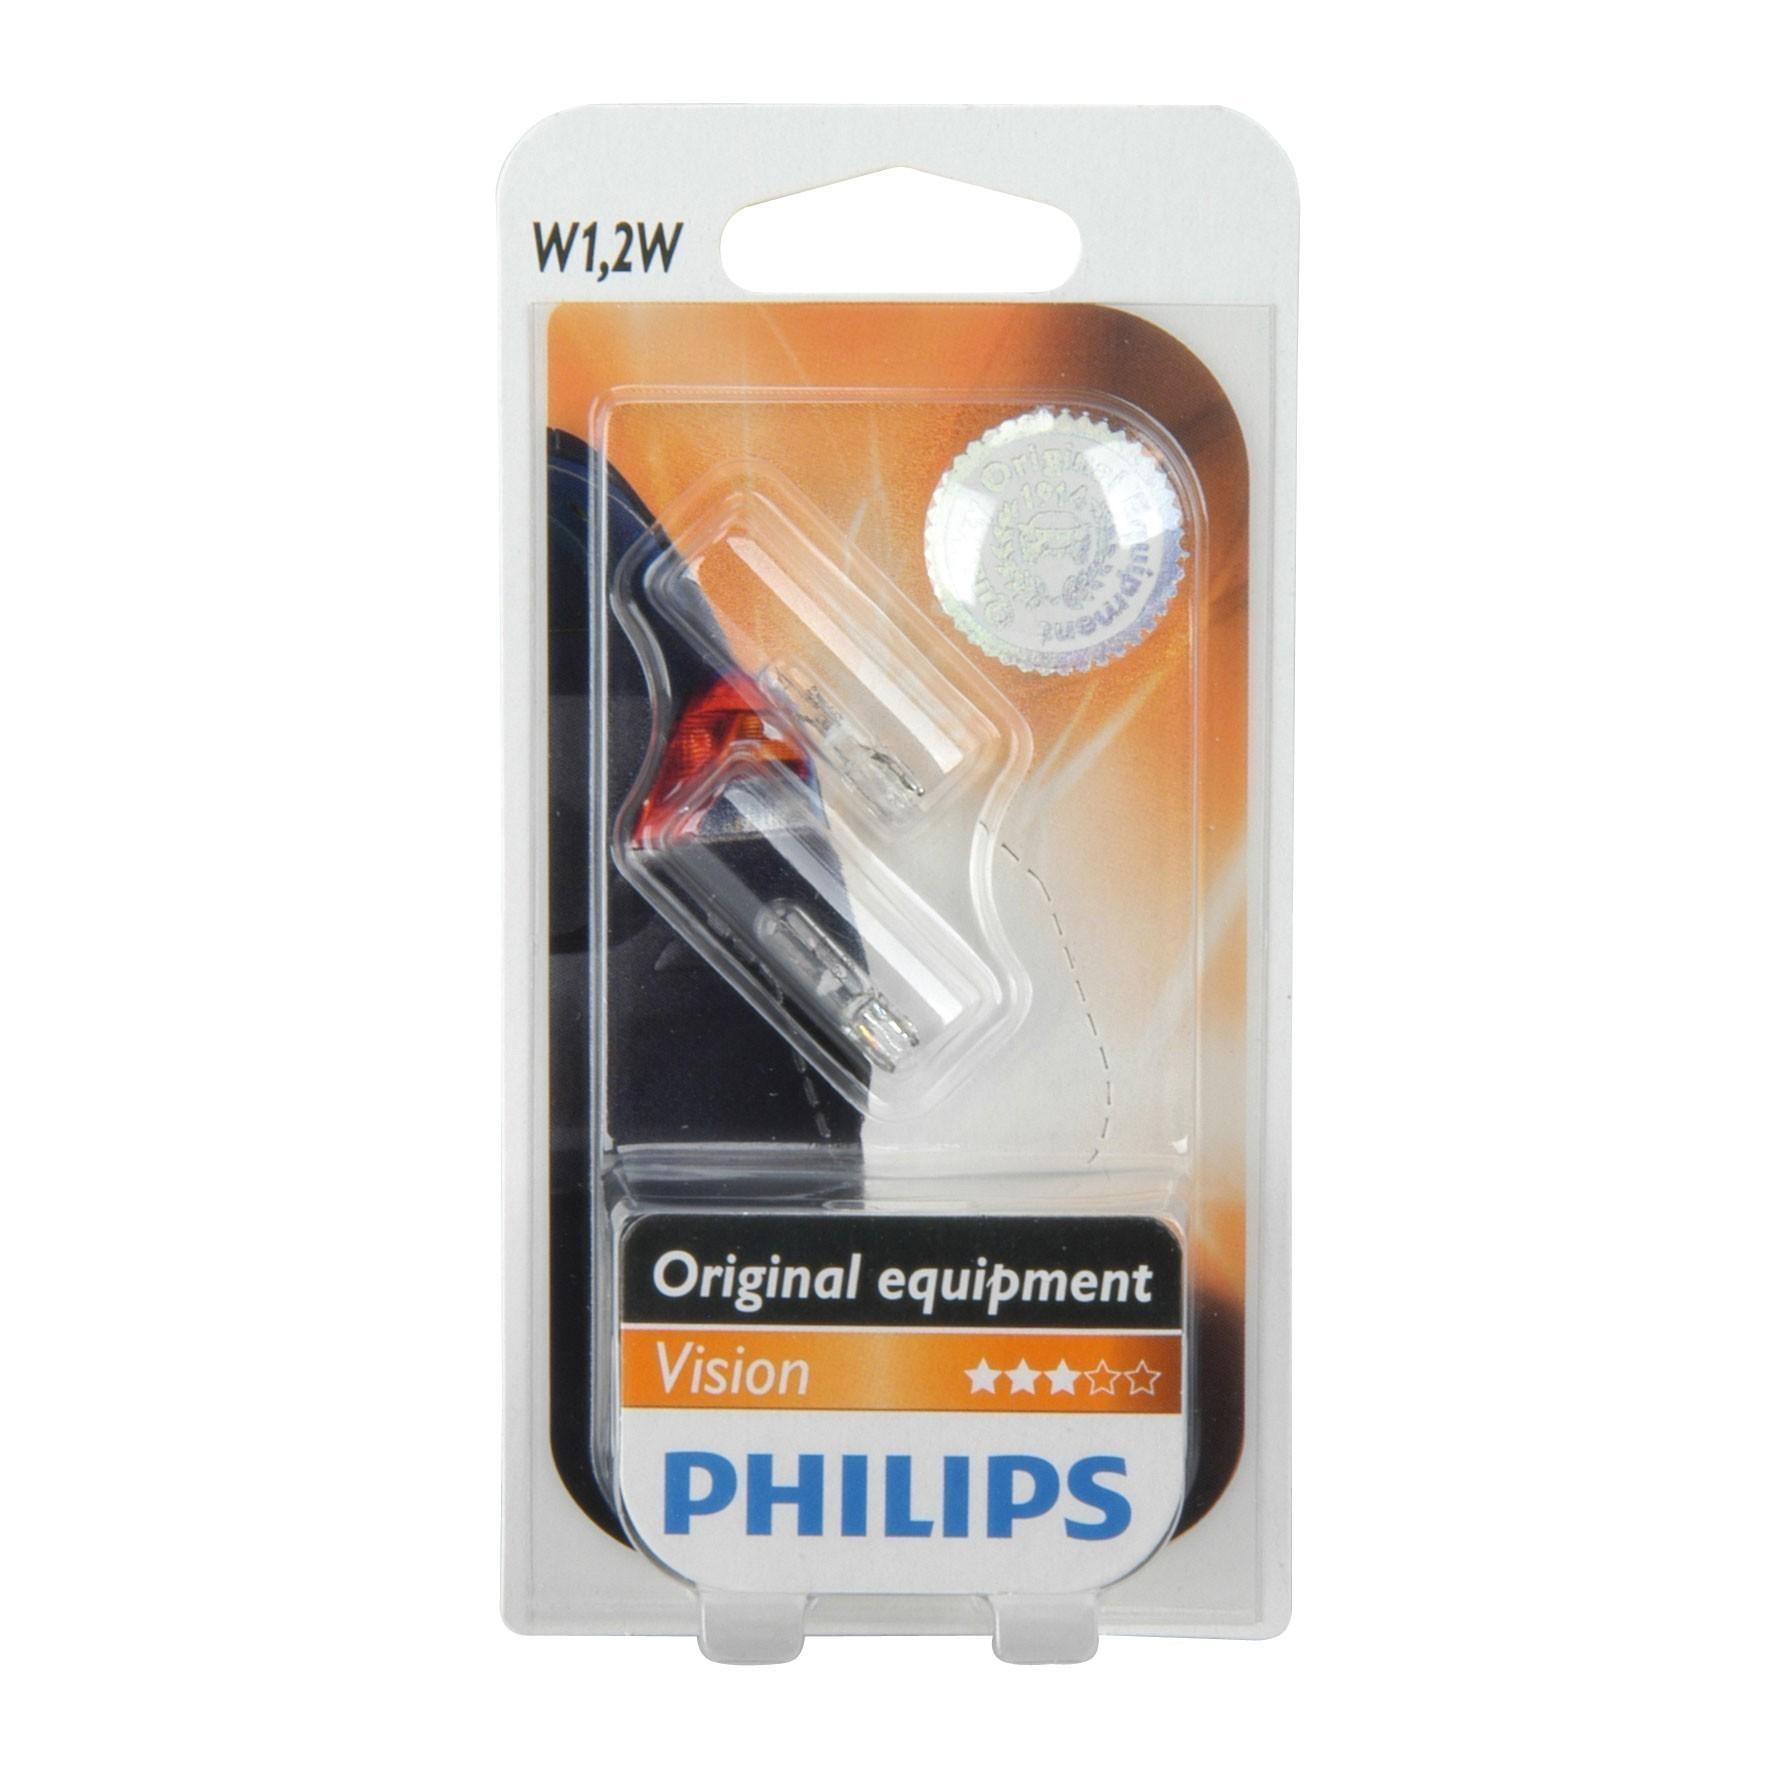 Philips Glassockellampe T5 12 Volt /  1,2 Watt 2 Stück - Autobeleucht. Bild 1